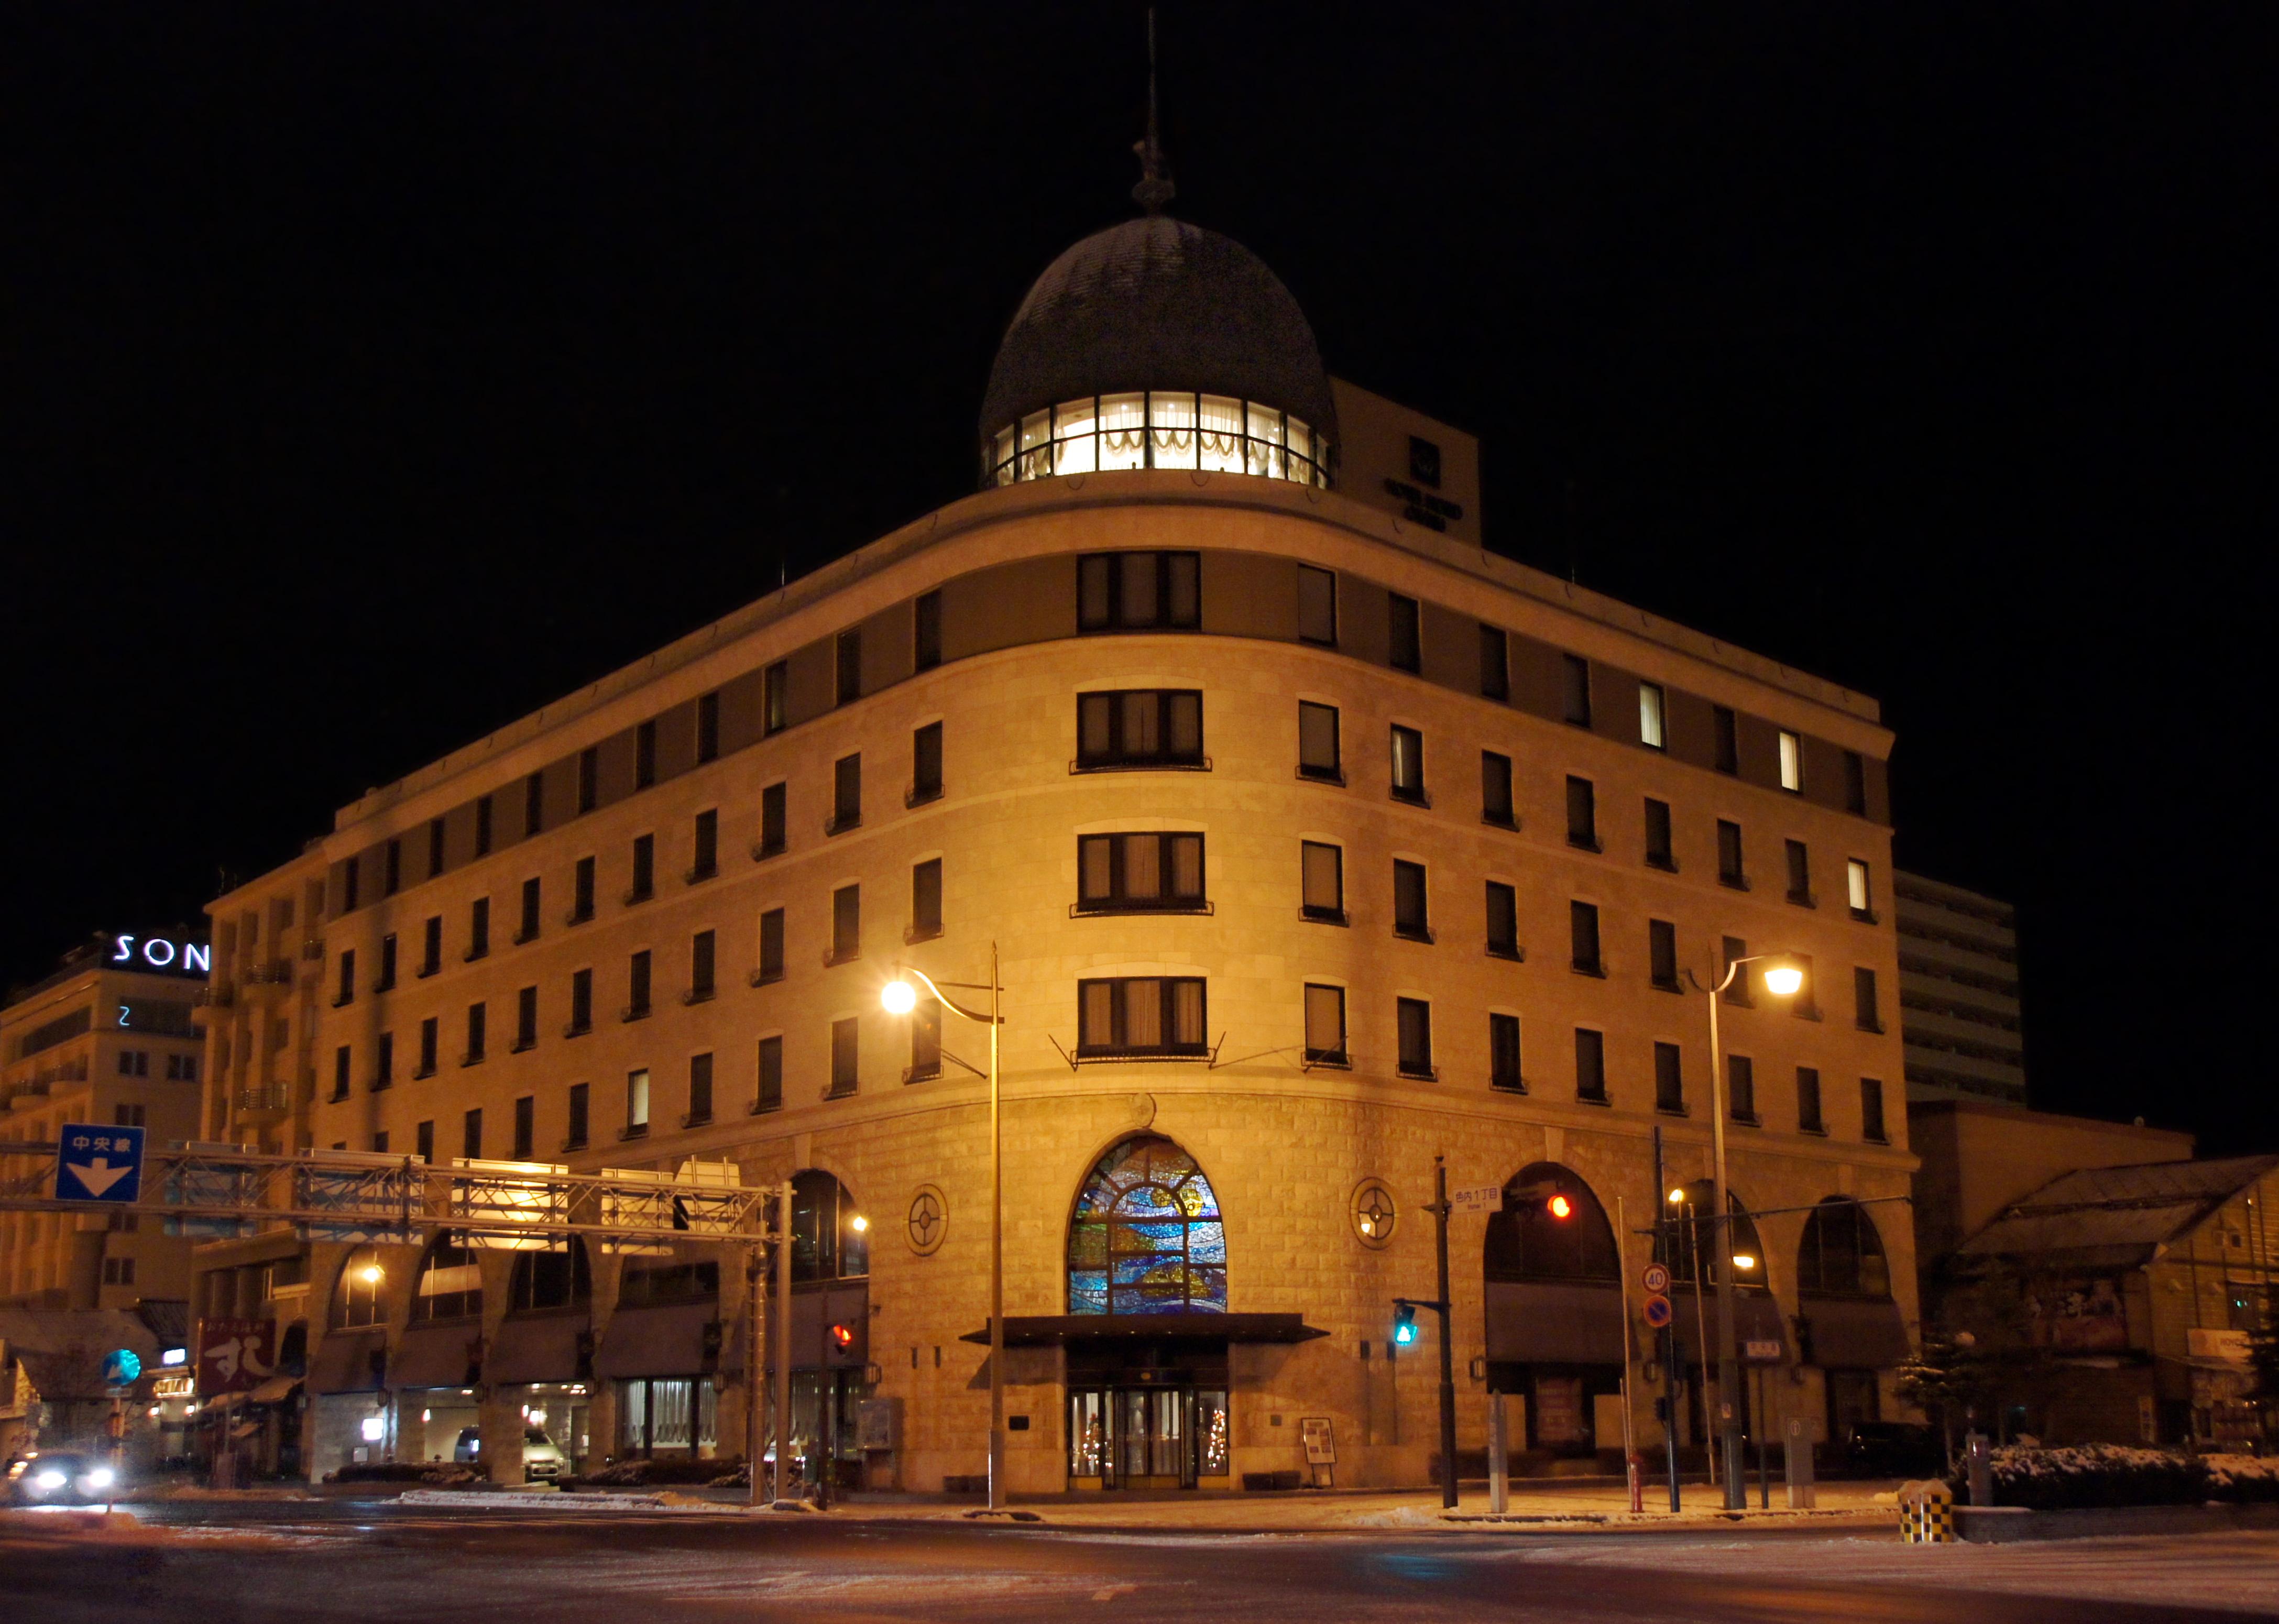 Hotel Nord Otaru Filehotel Nord Otaru Hokkaido Japan01s5jpg Wikimedia Commons